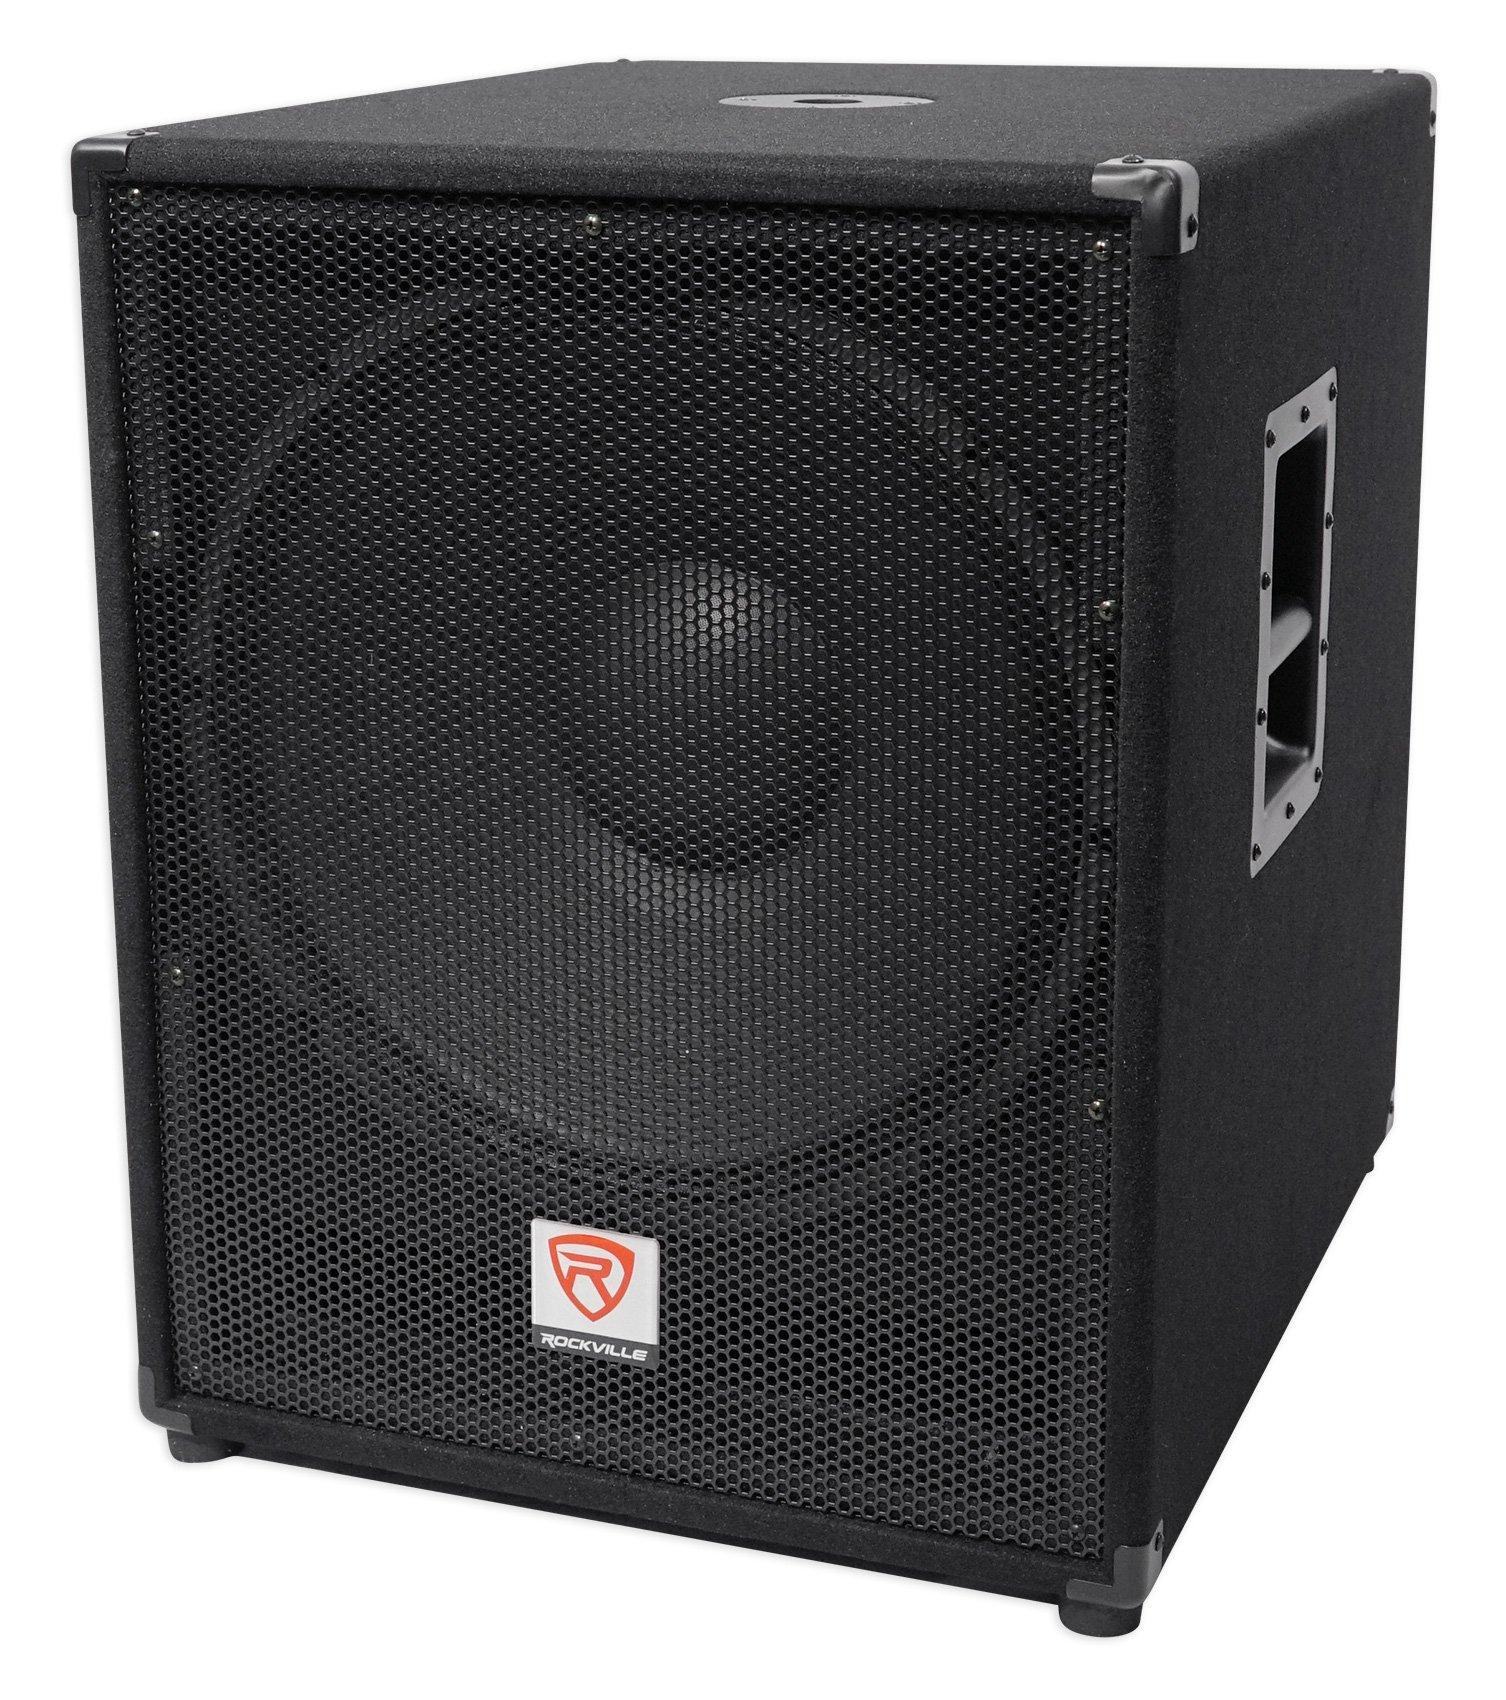 Rockville PBG18 18'' Passive 2000 Watt 8 Ohm Pro Audio Subwoofer Sub/MDF Cabinet by Rockville